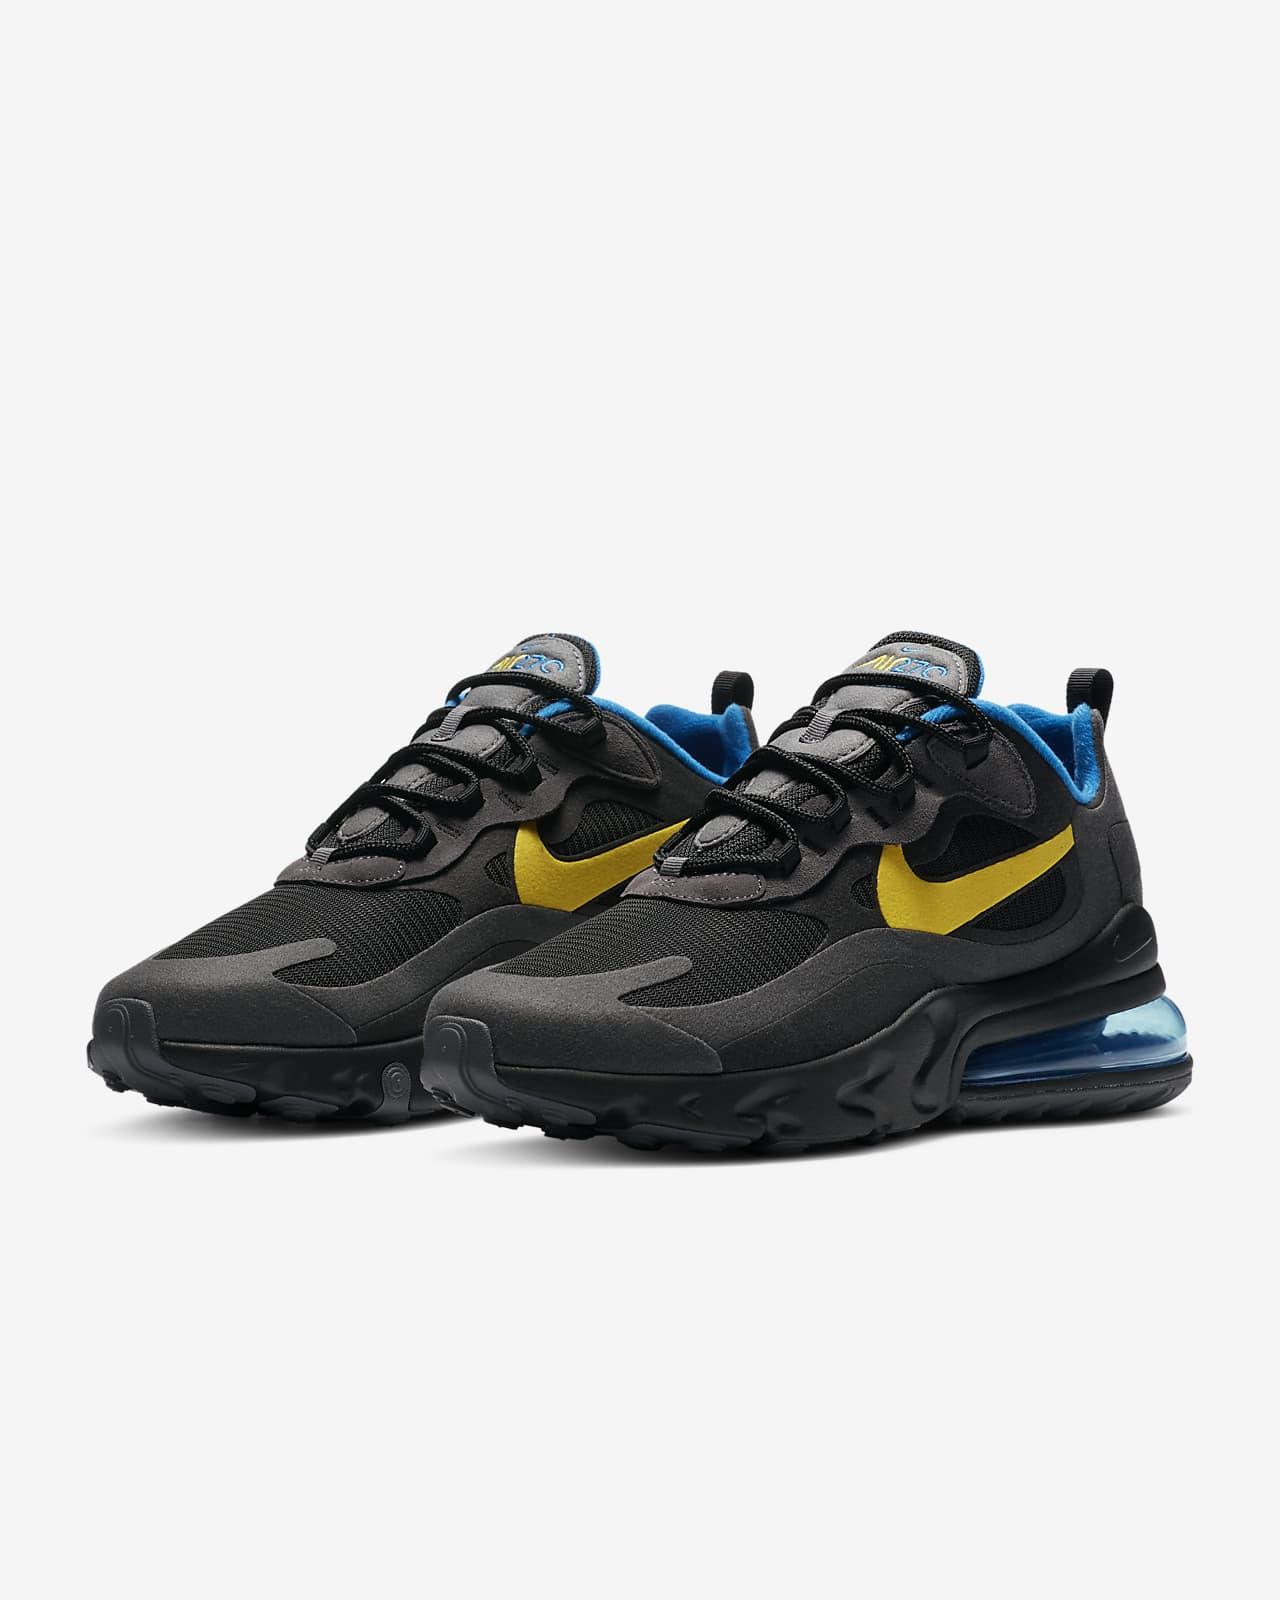 Nike Air Max 270 React Men's Shoes. Nike LU